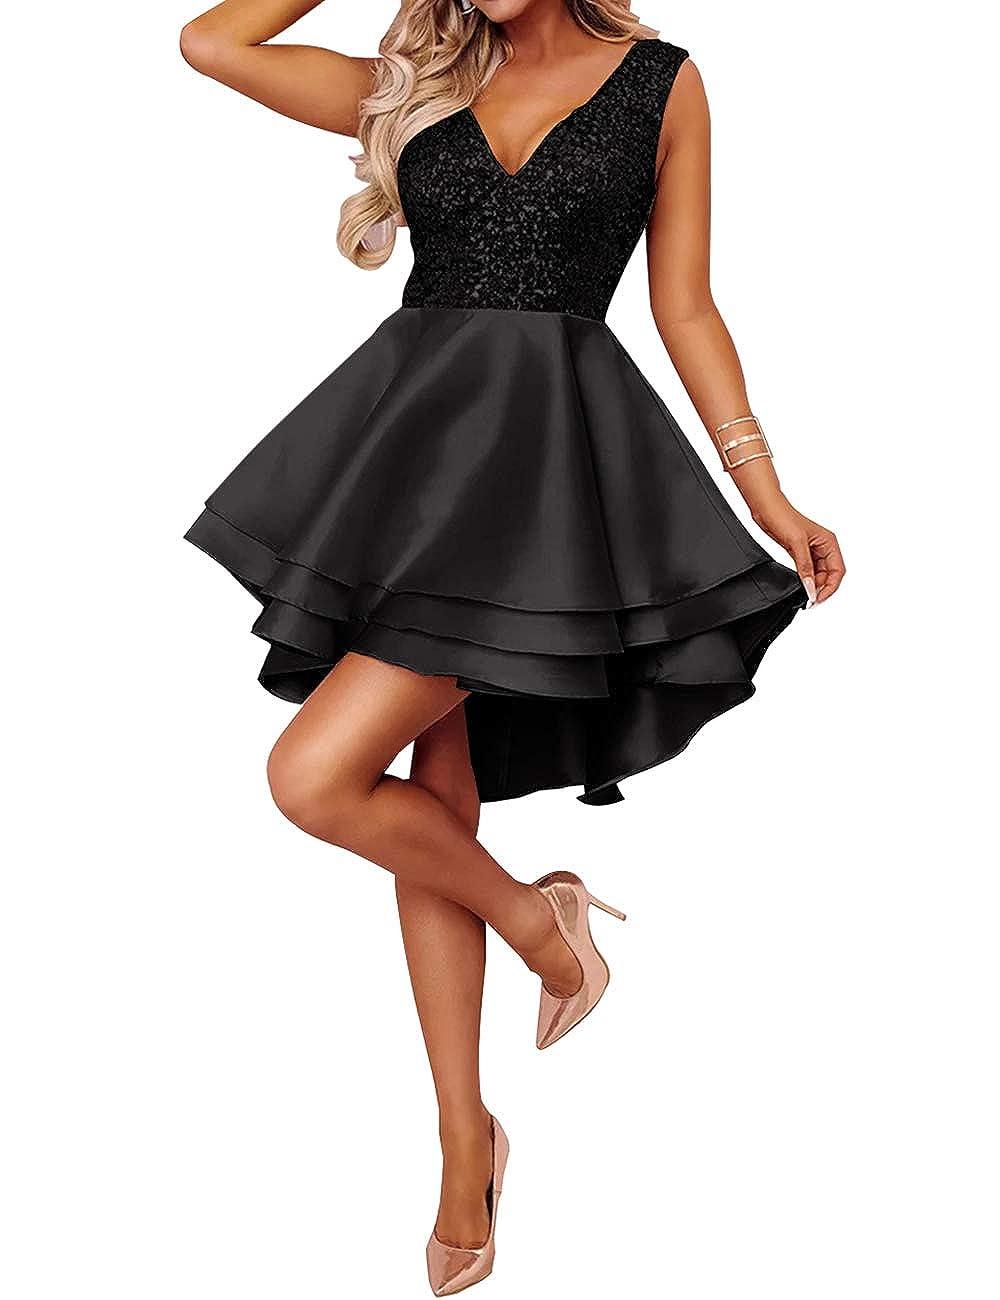 Lrady Womens Sequin Glitter V Neck Skater Mini Club Cocktail Party Swing Dress